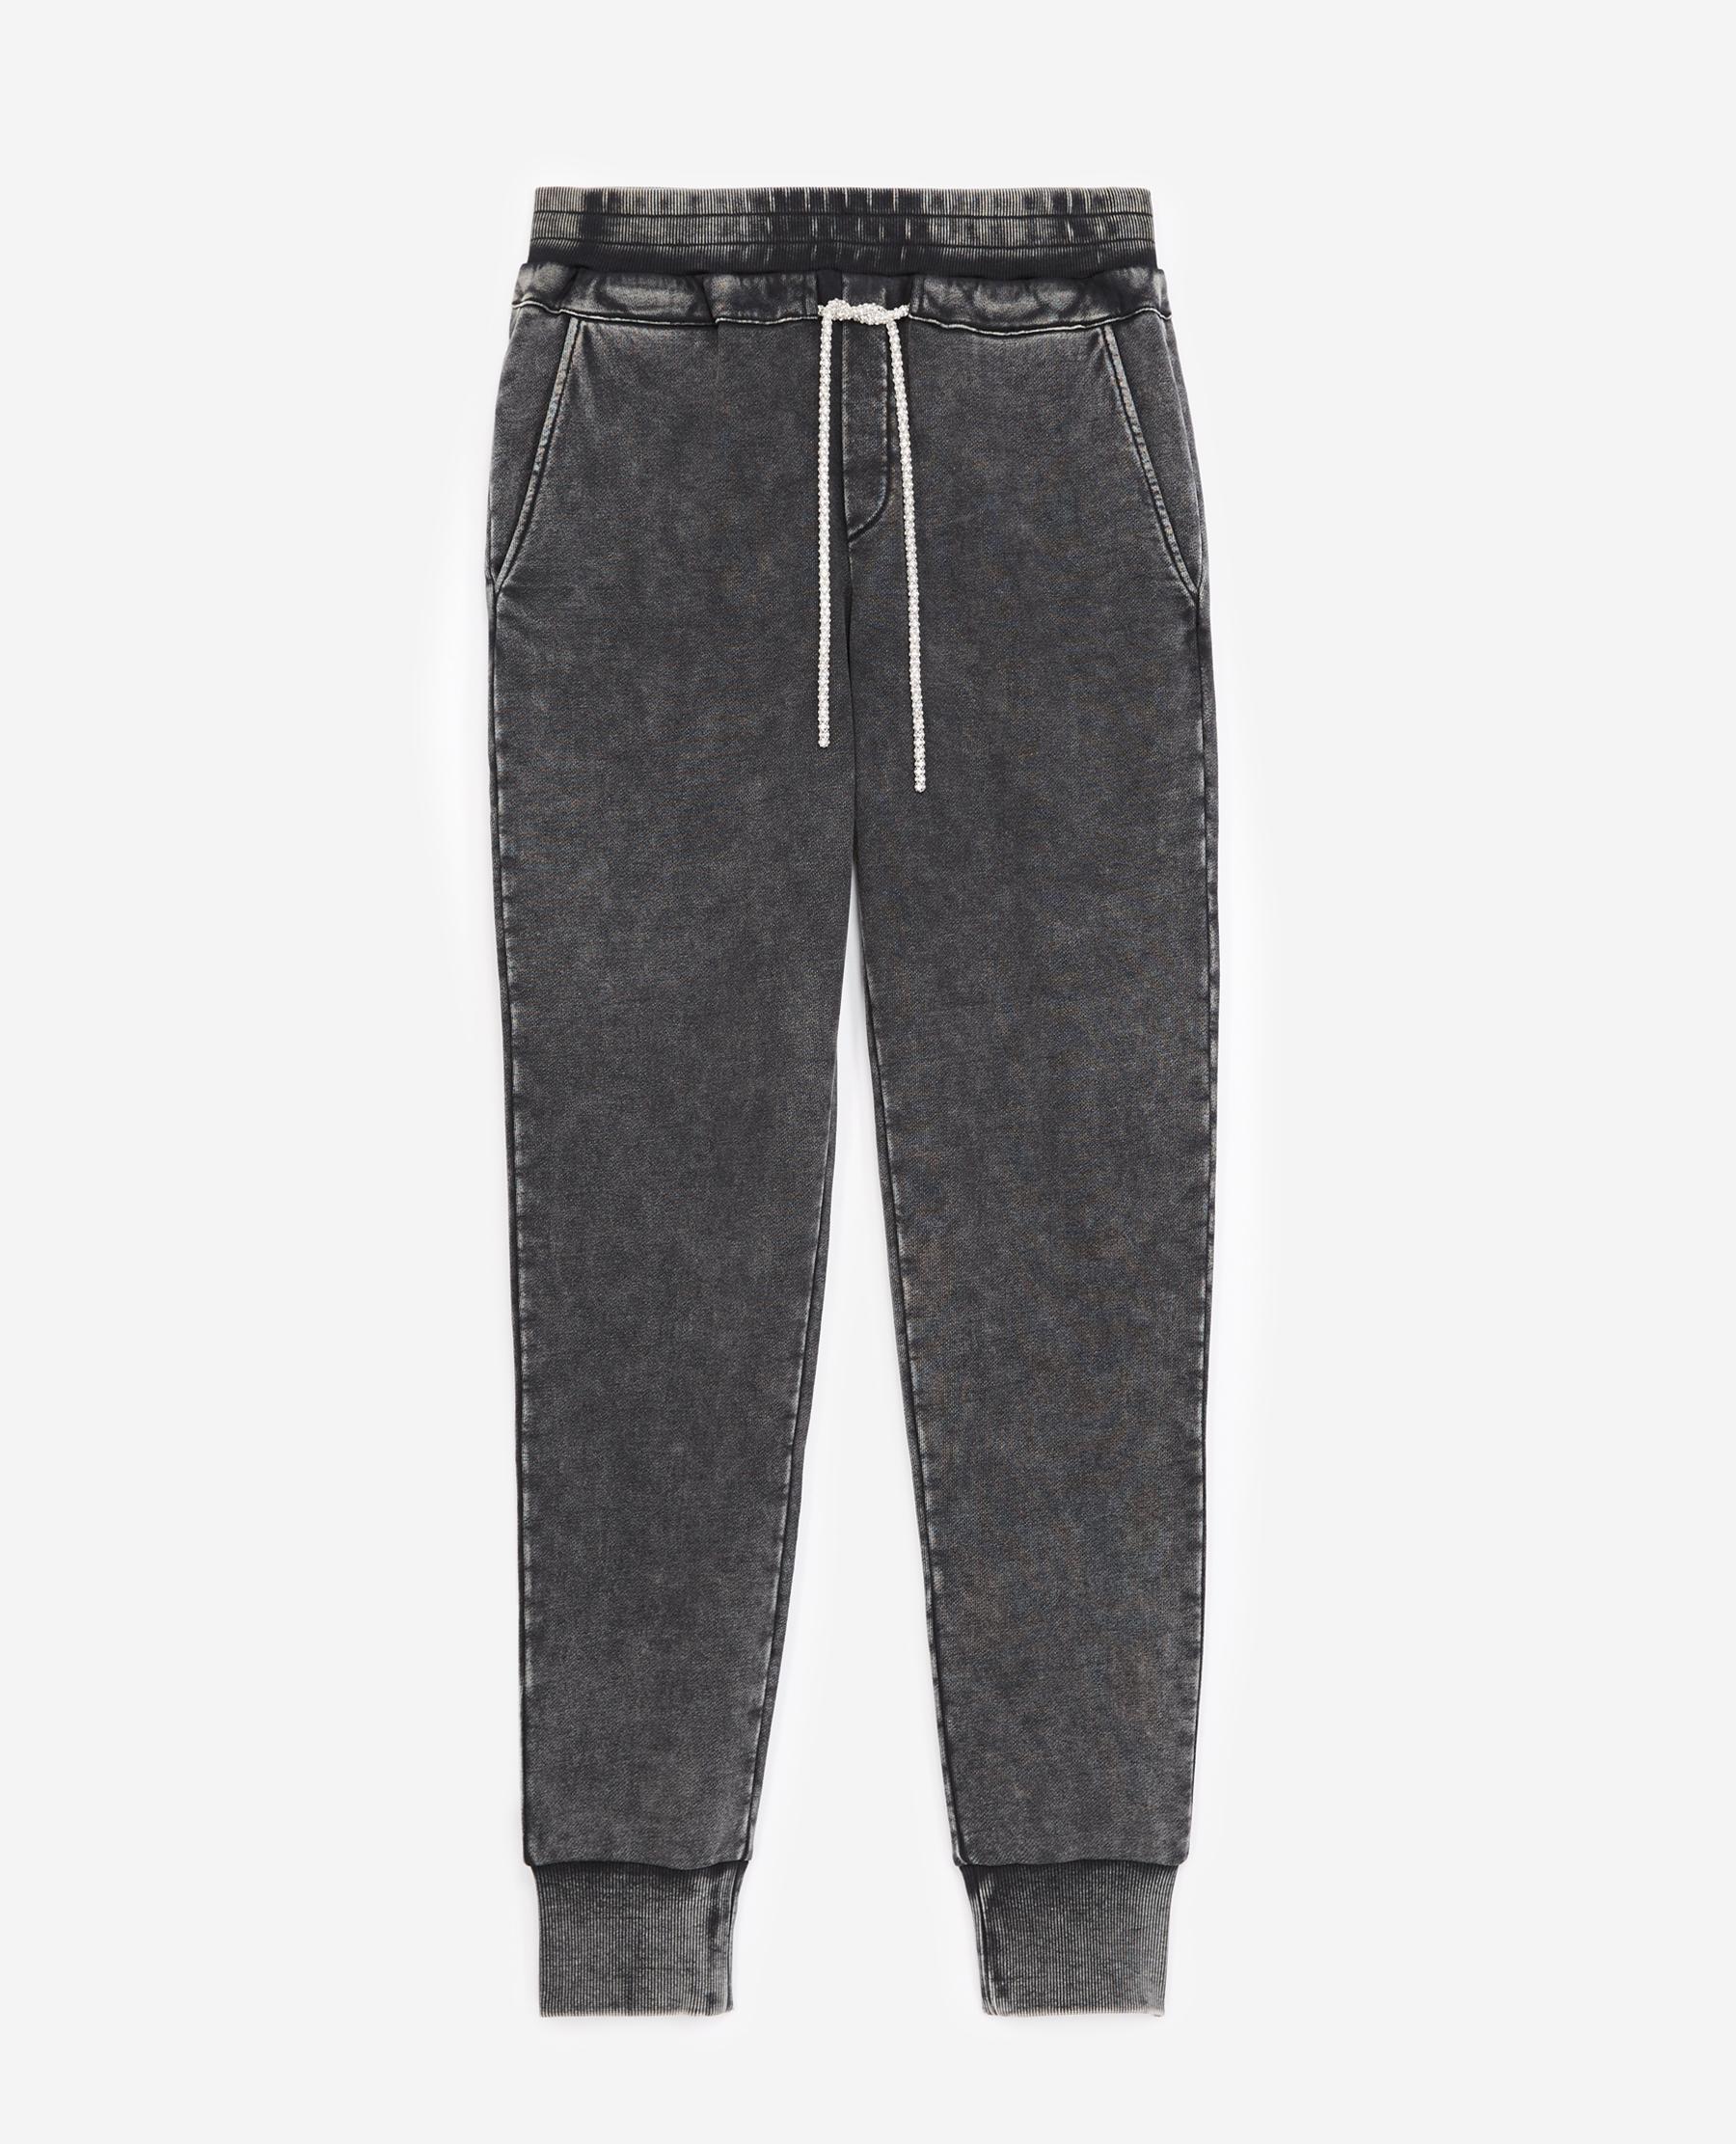 Pantalón de algodón lavado,  Kooples Sport (158 ¤)